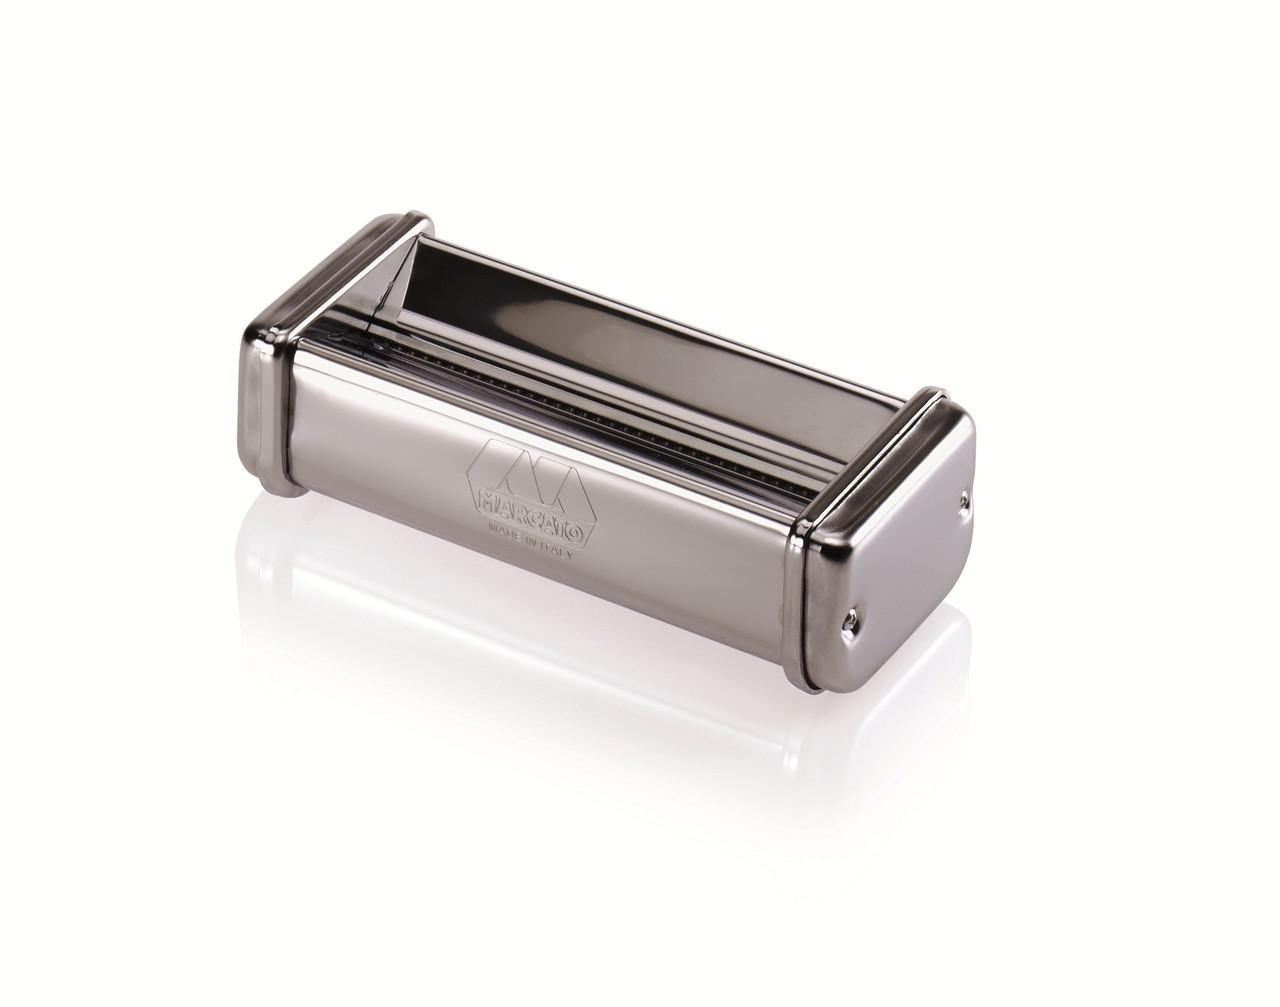 Насадка лапшерезка Marcato Accessorio Spaghetti 2 mm ширина лапши для Pasta Mixer Wellness